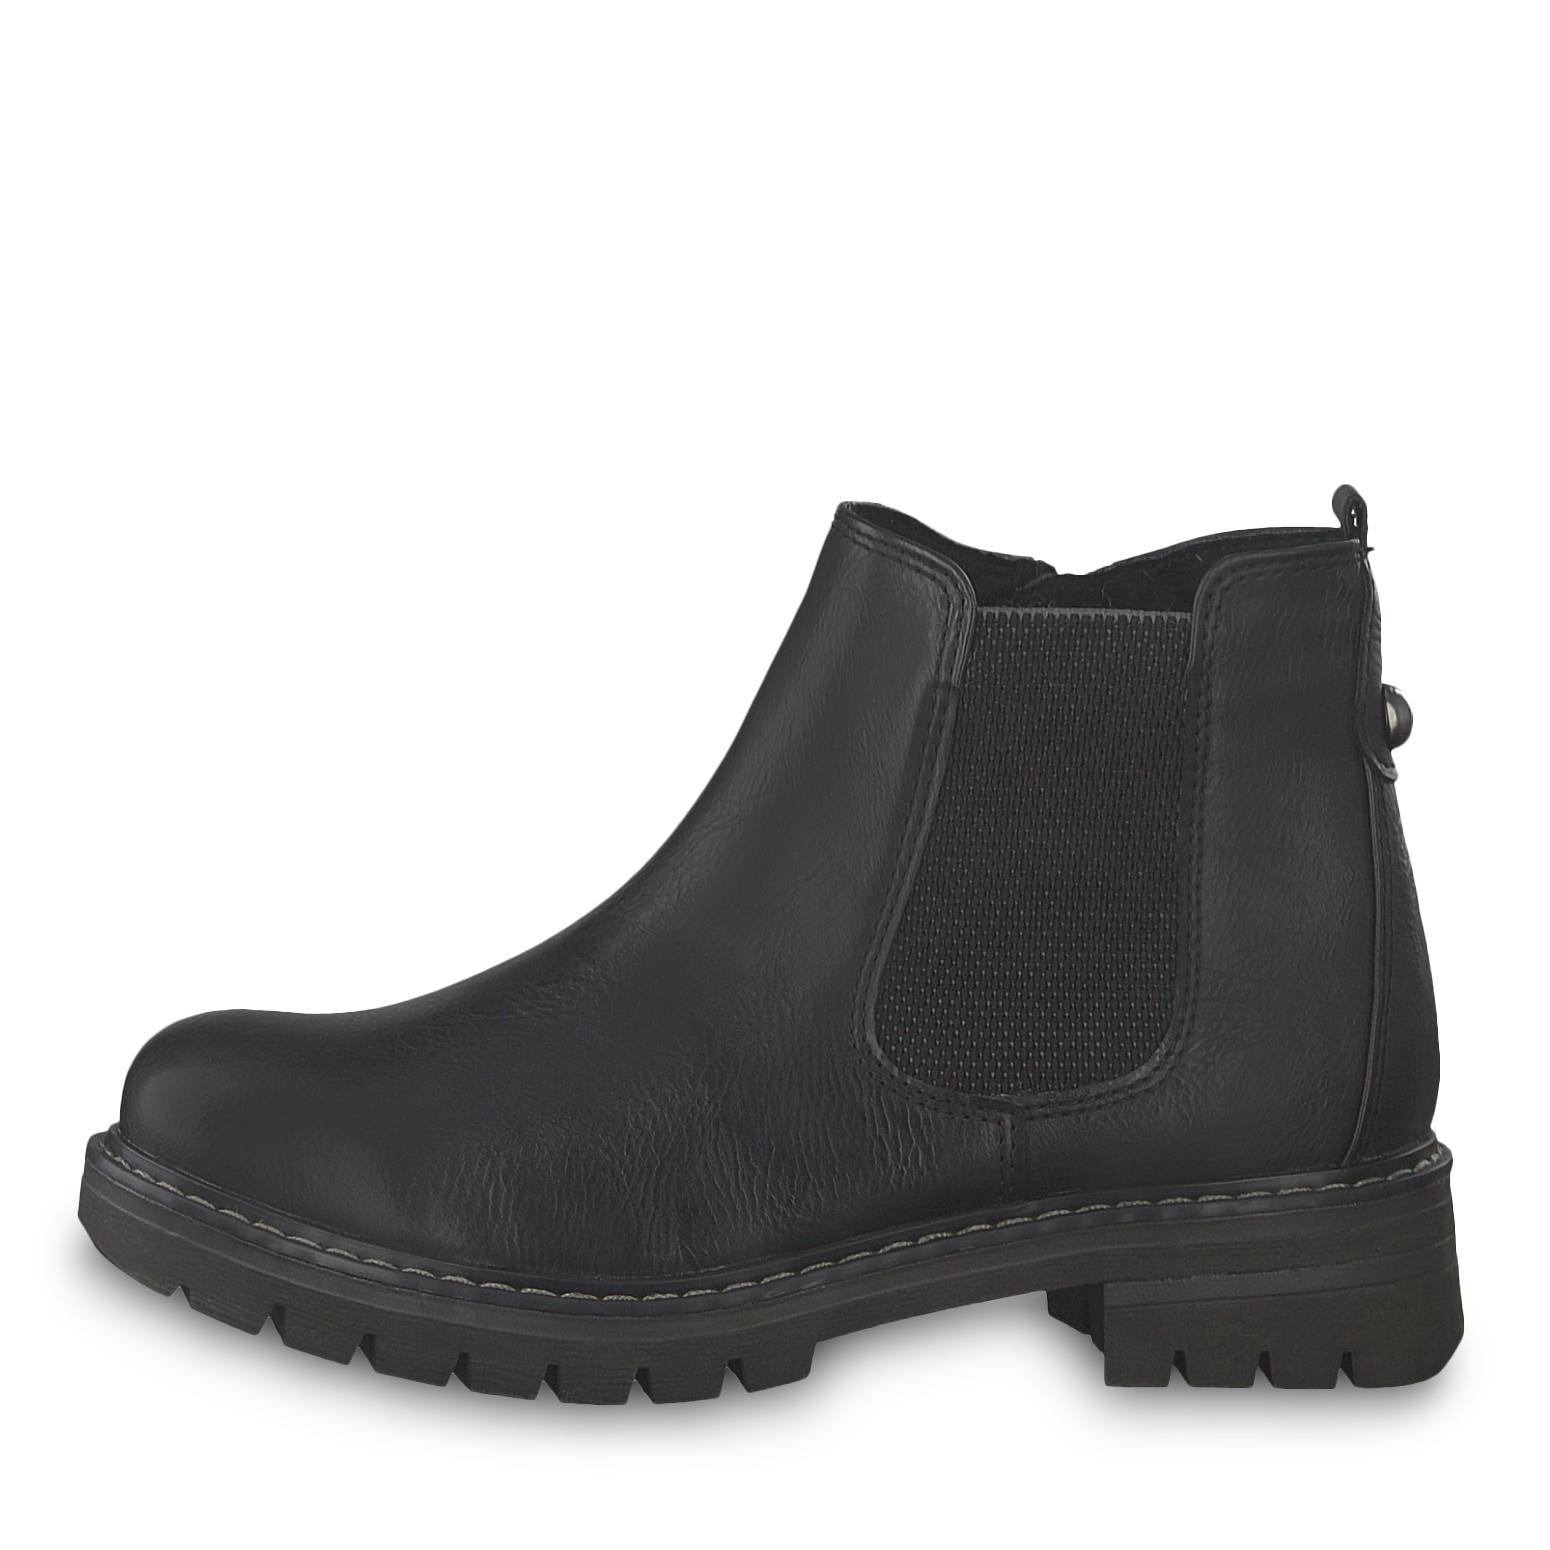 huge discount b11a4 c4234 Chelsea Boot